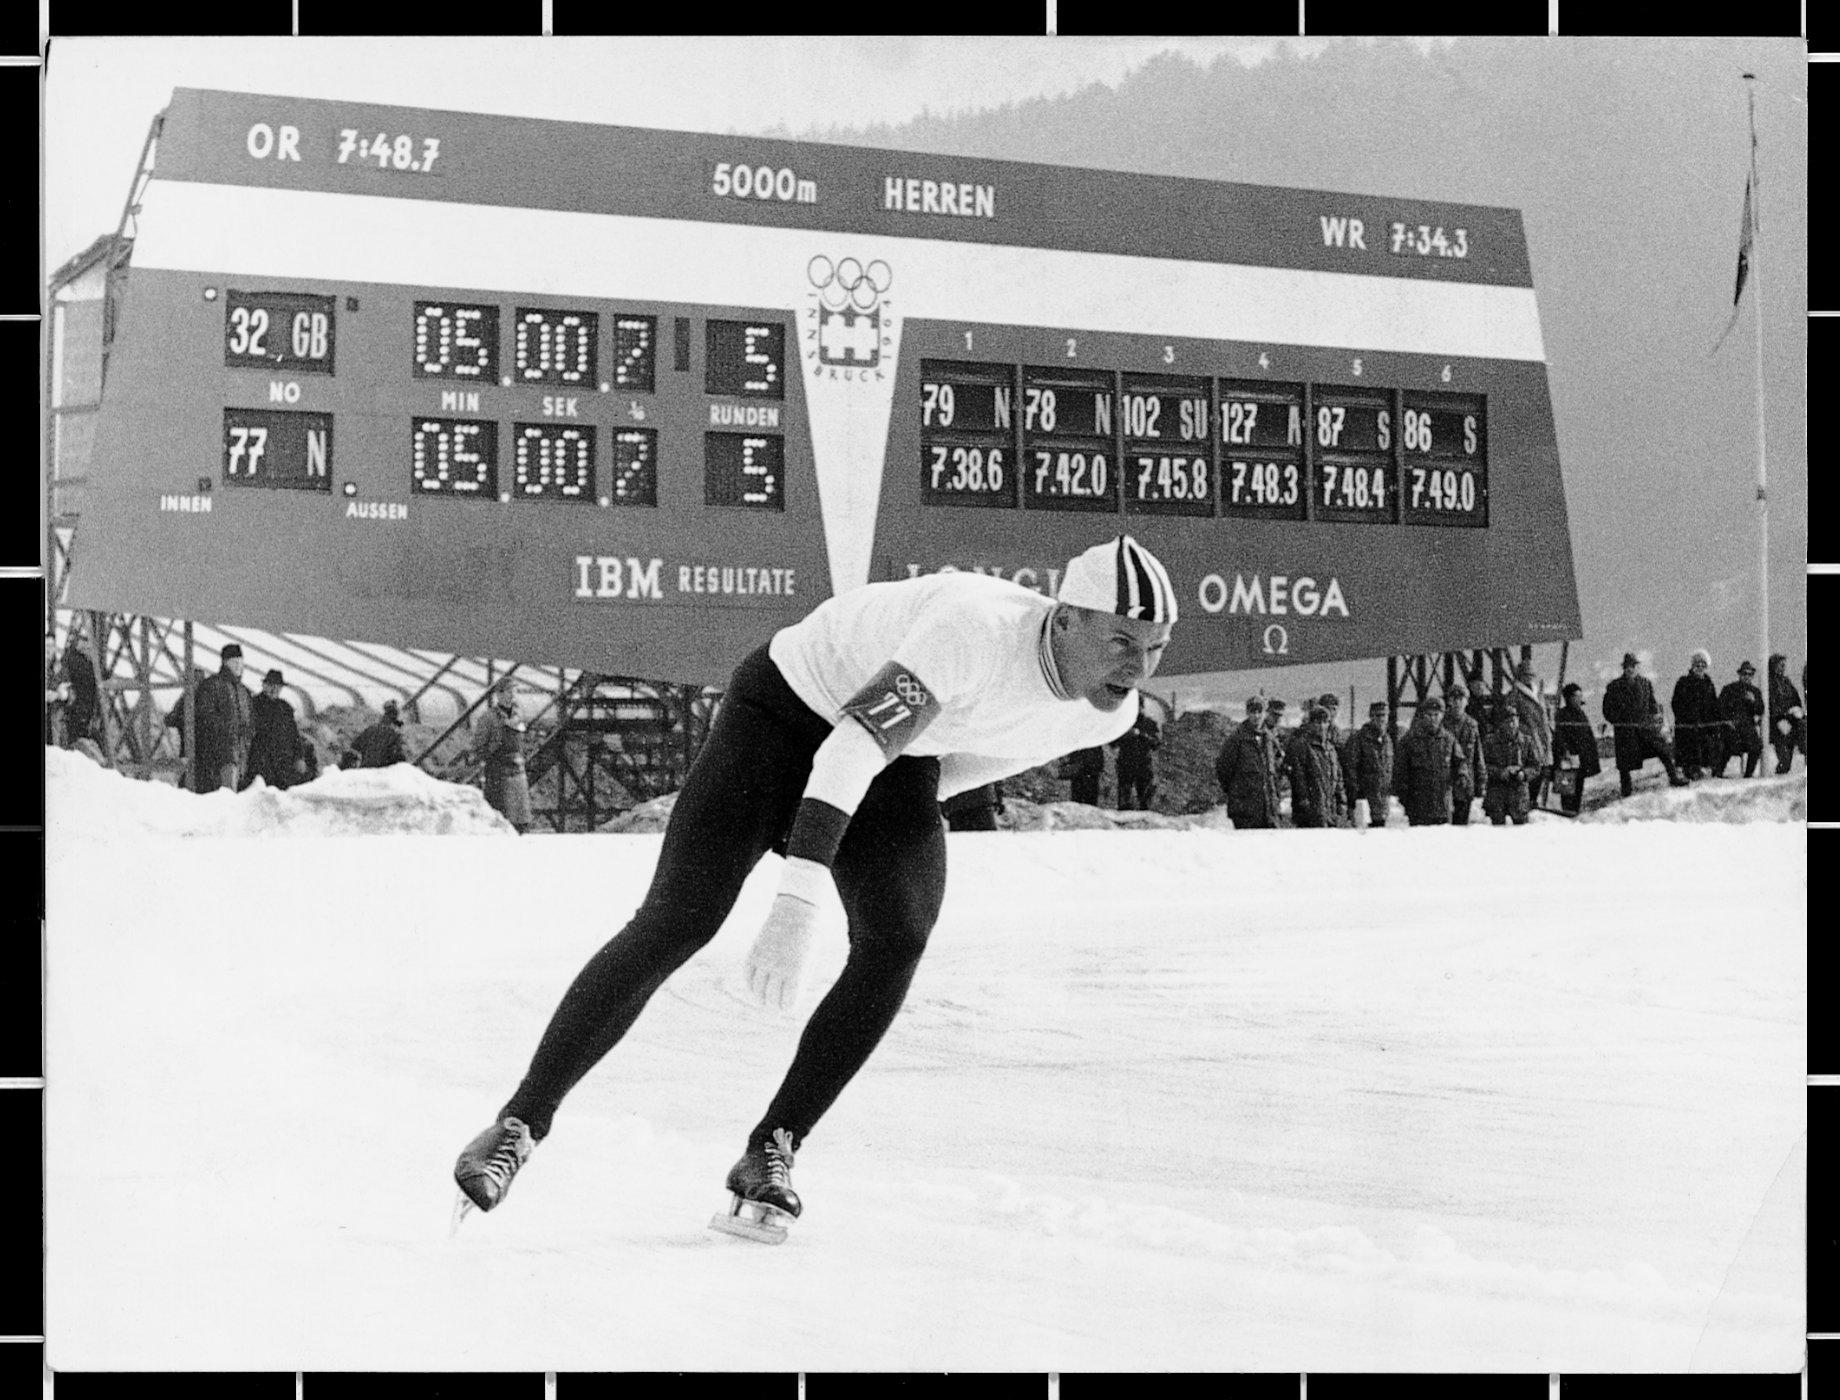 Timing board used during speed skating, Innsbruck 1964.